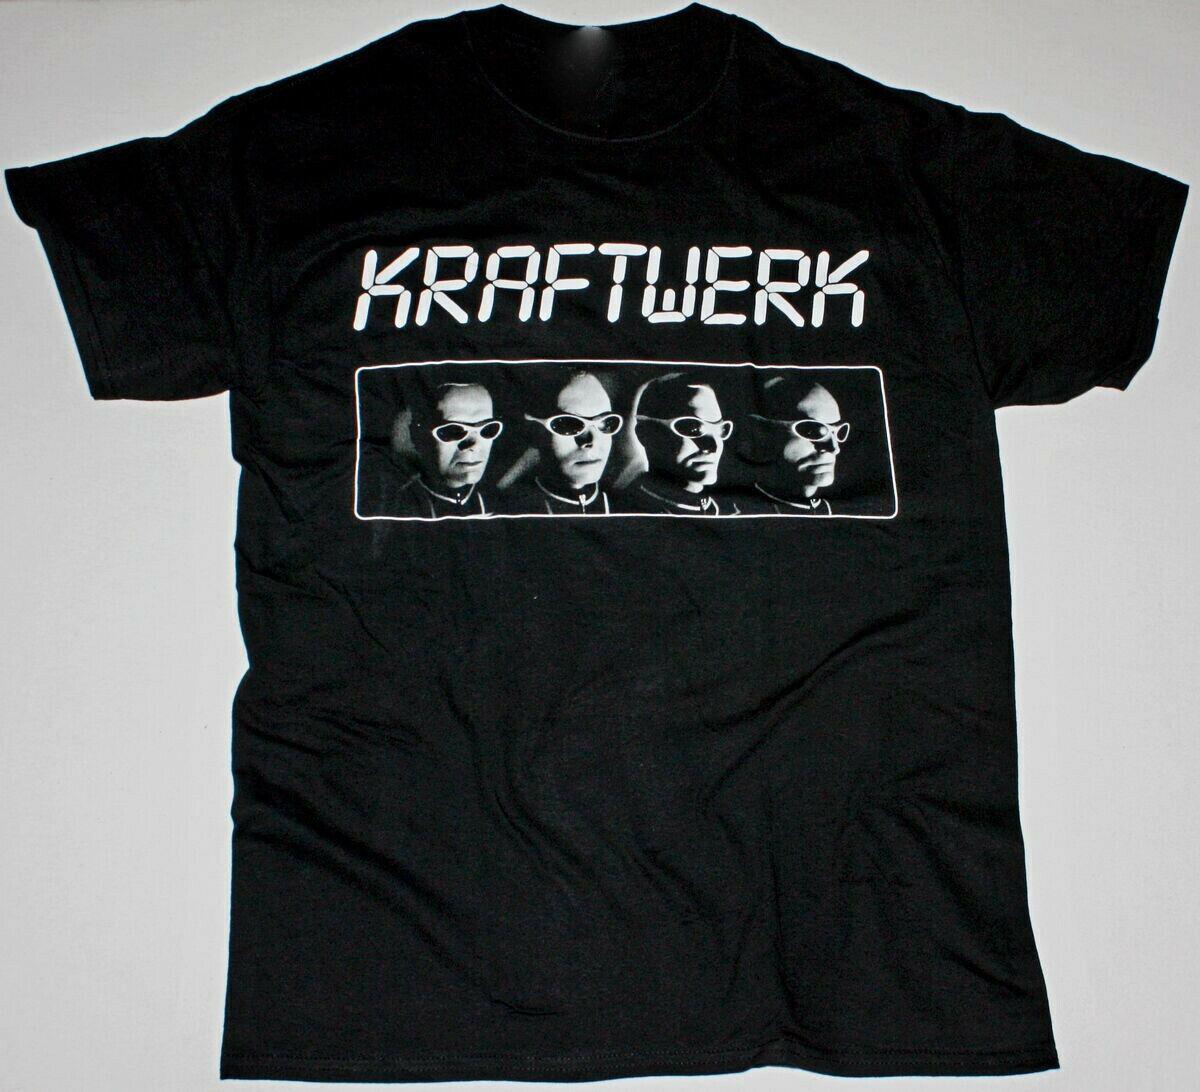 Kraftwerk Den, negro, 100 algodón, reimpresión, Unisex, todas las tallas, camiseta M880